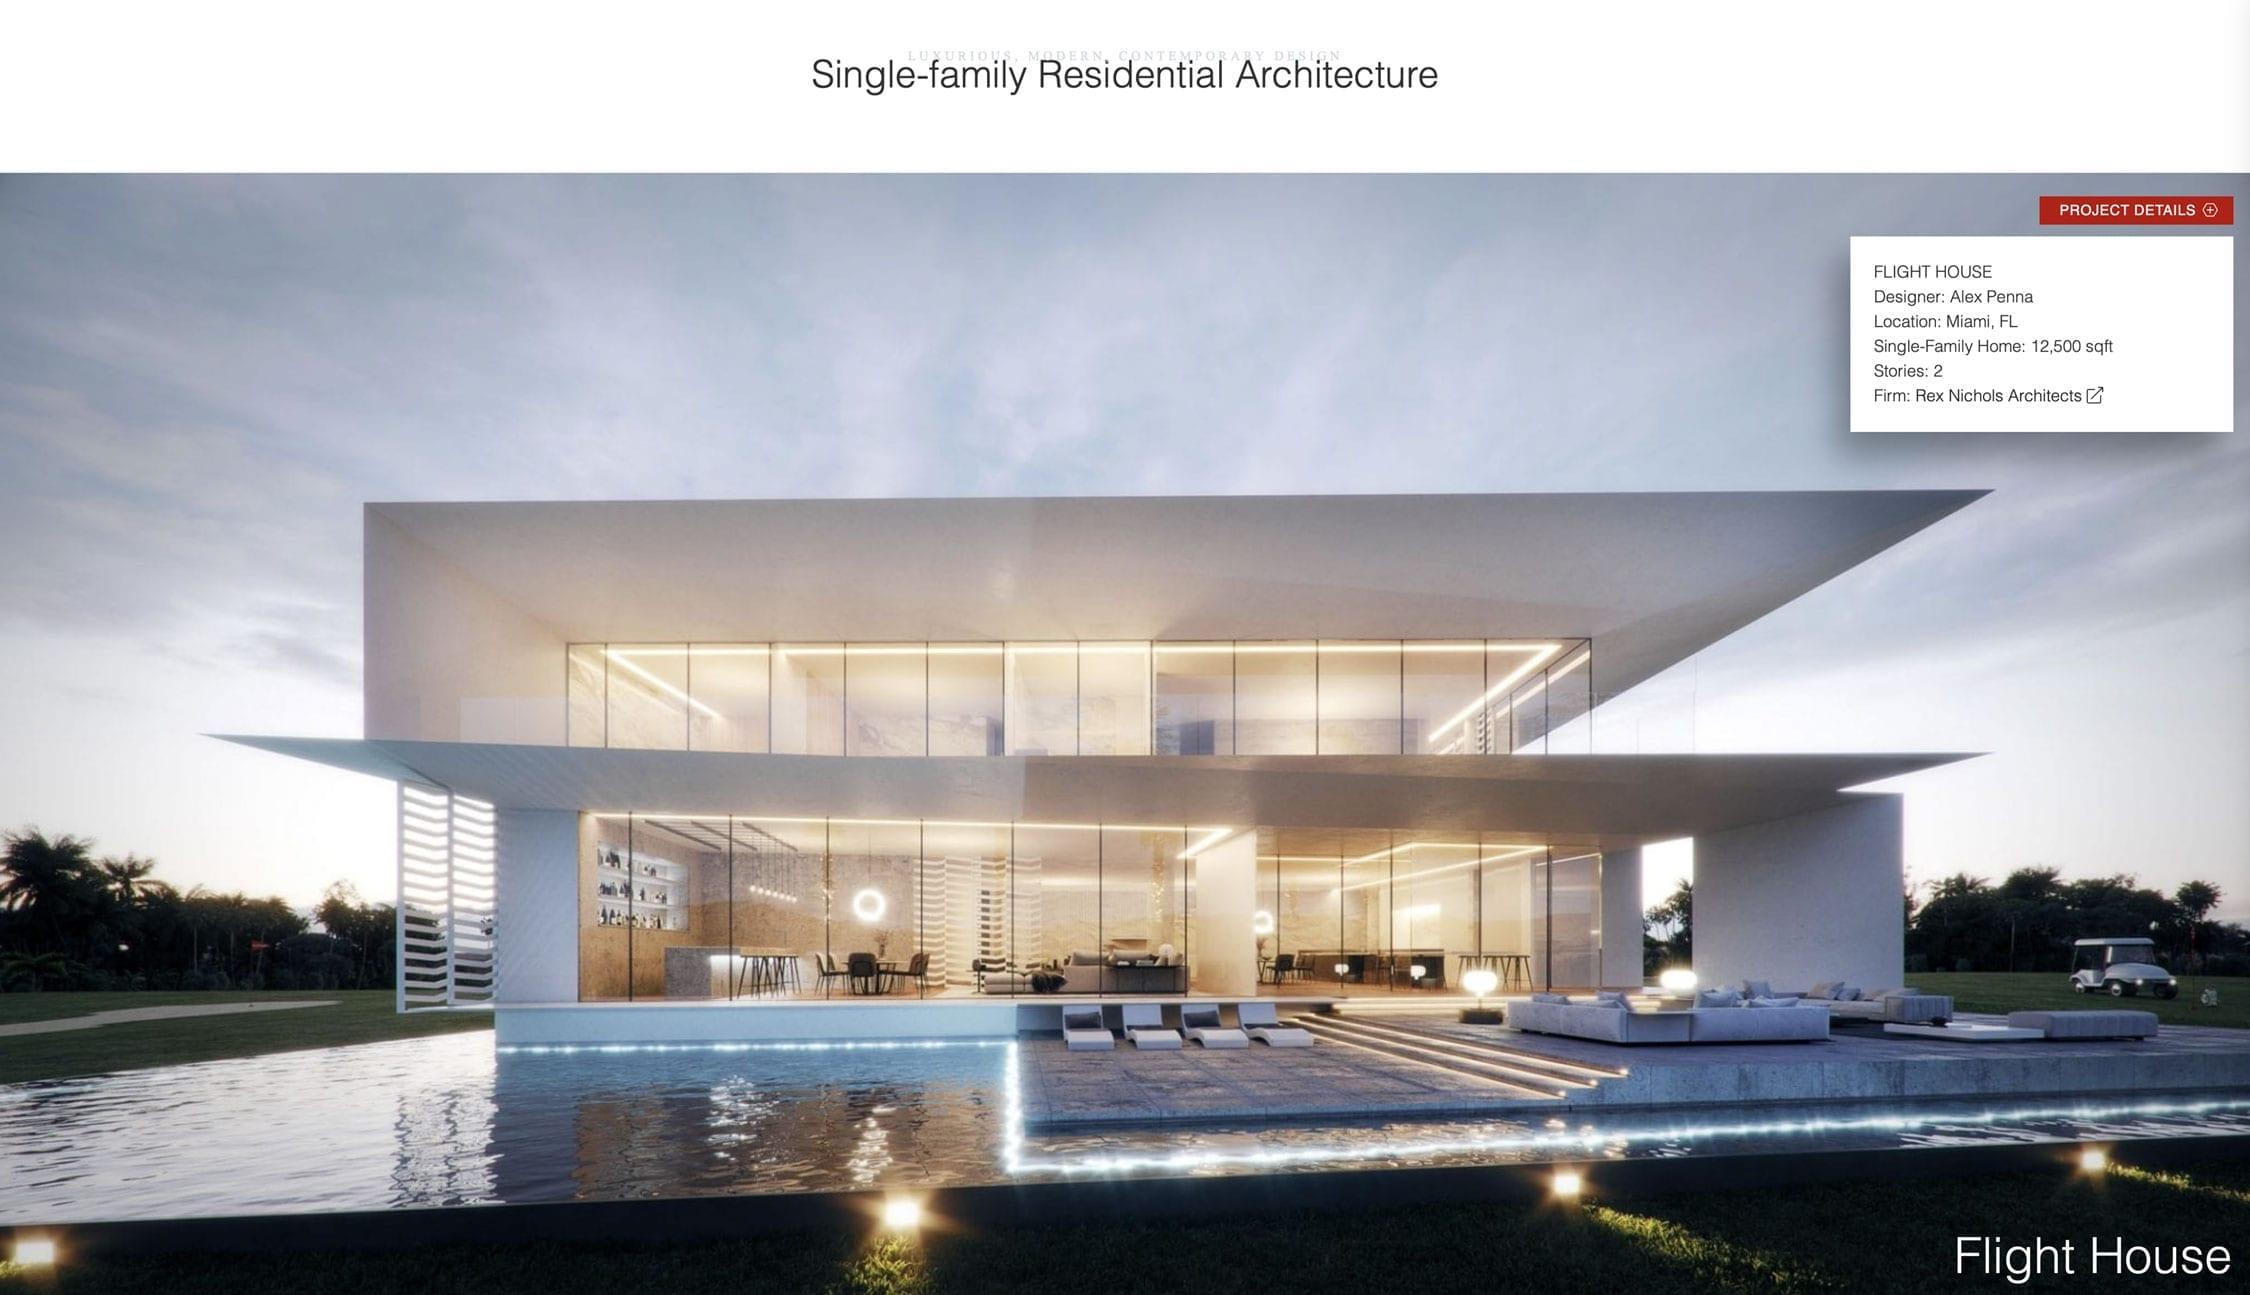 sli-Project-gallery-swedroearch-004